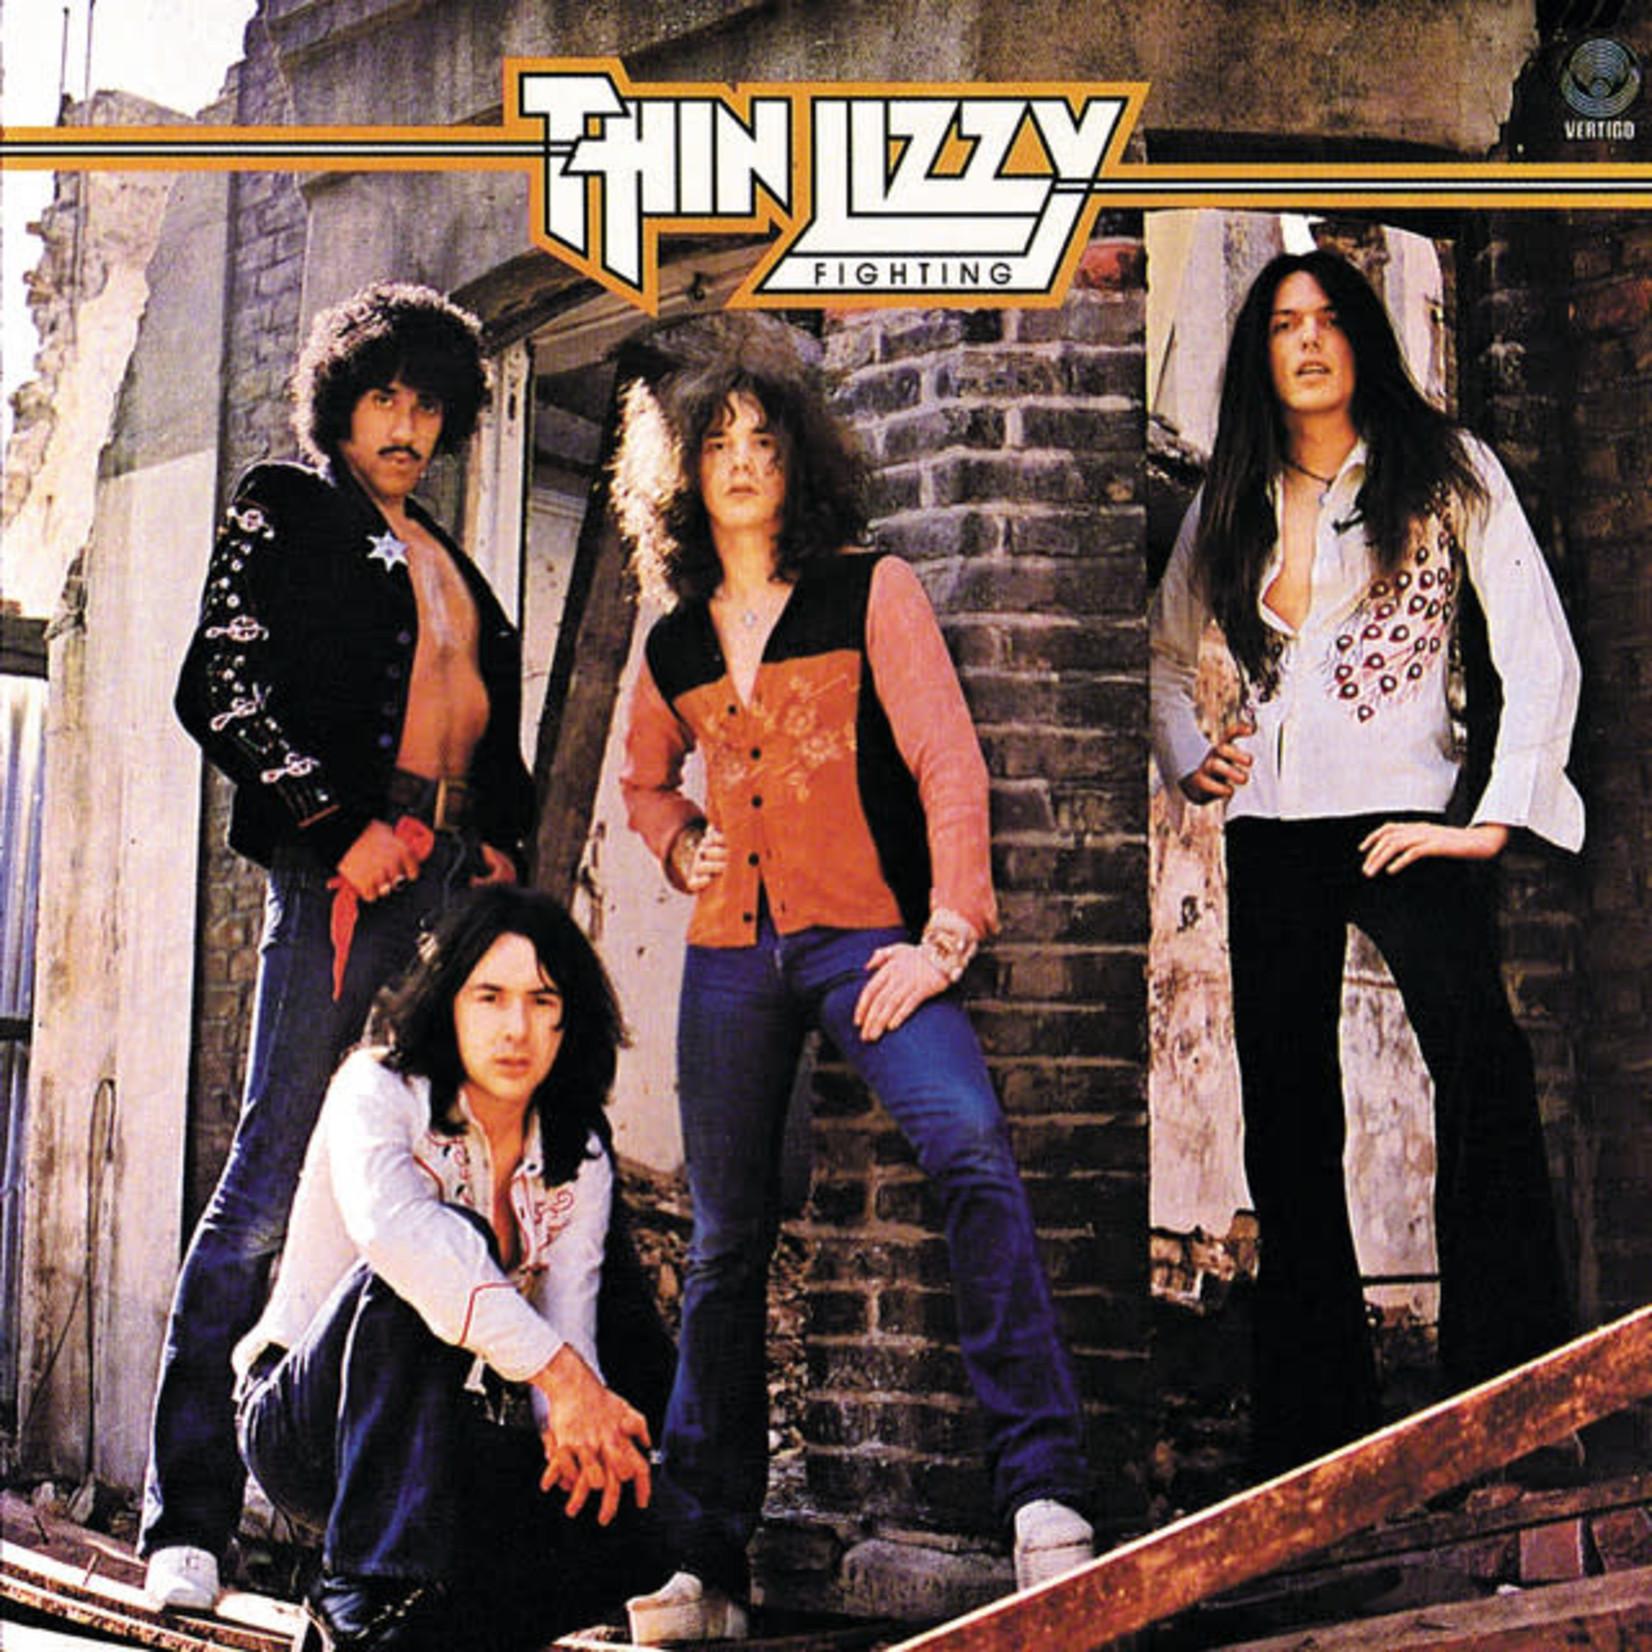 Vinyl Thin Lizzy - Fighting